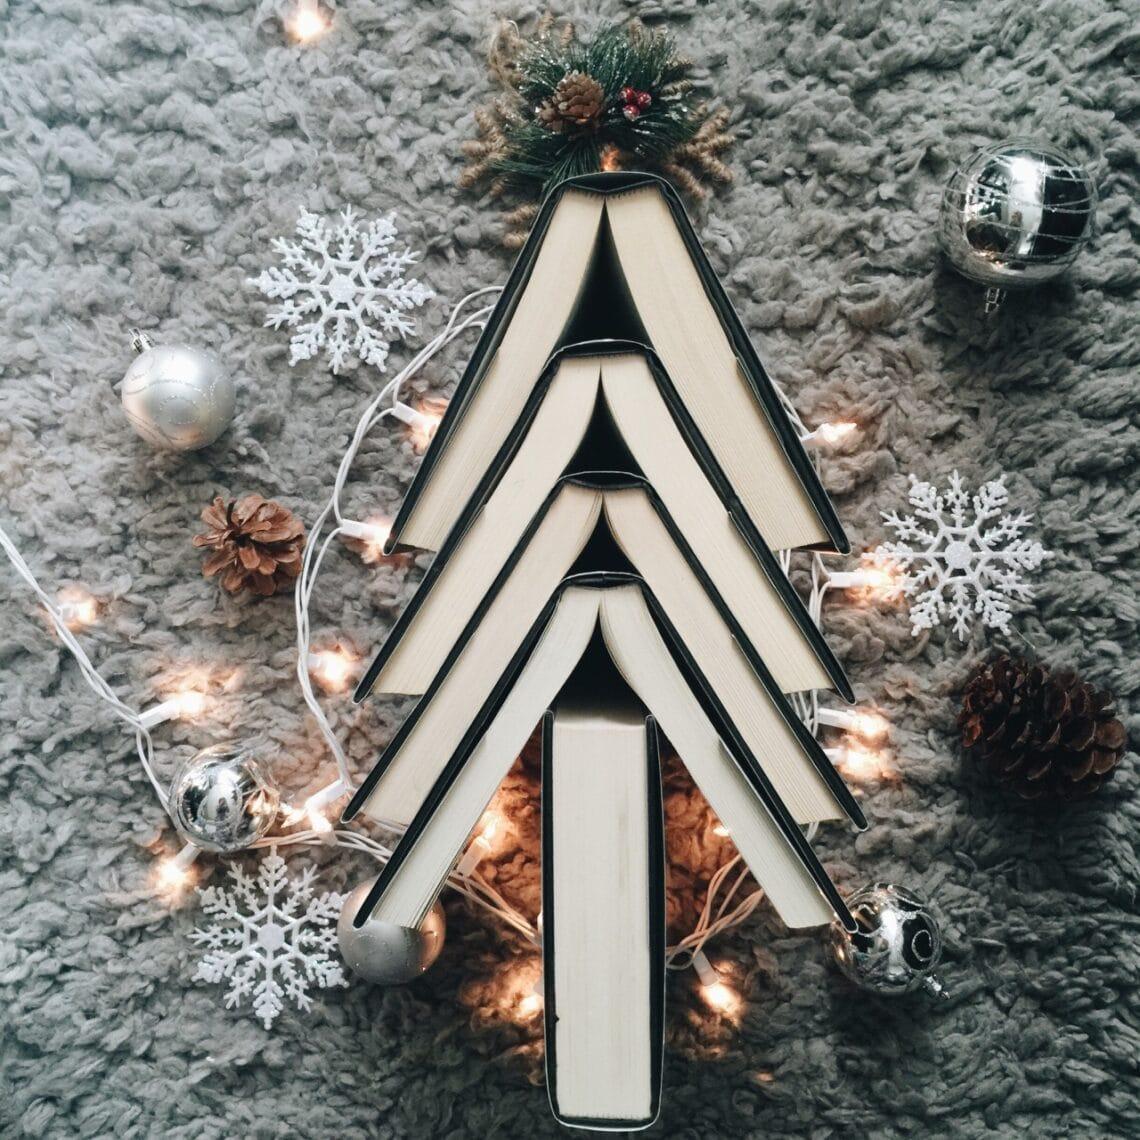 4 téli hangulatú romantikus könyv, decemberre